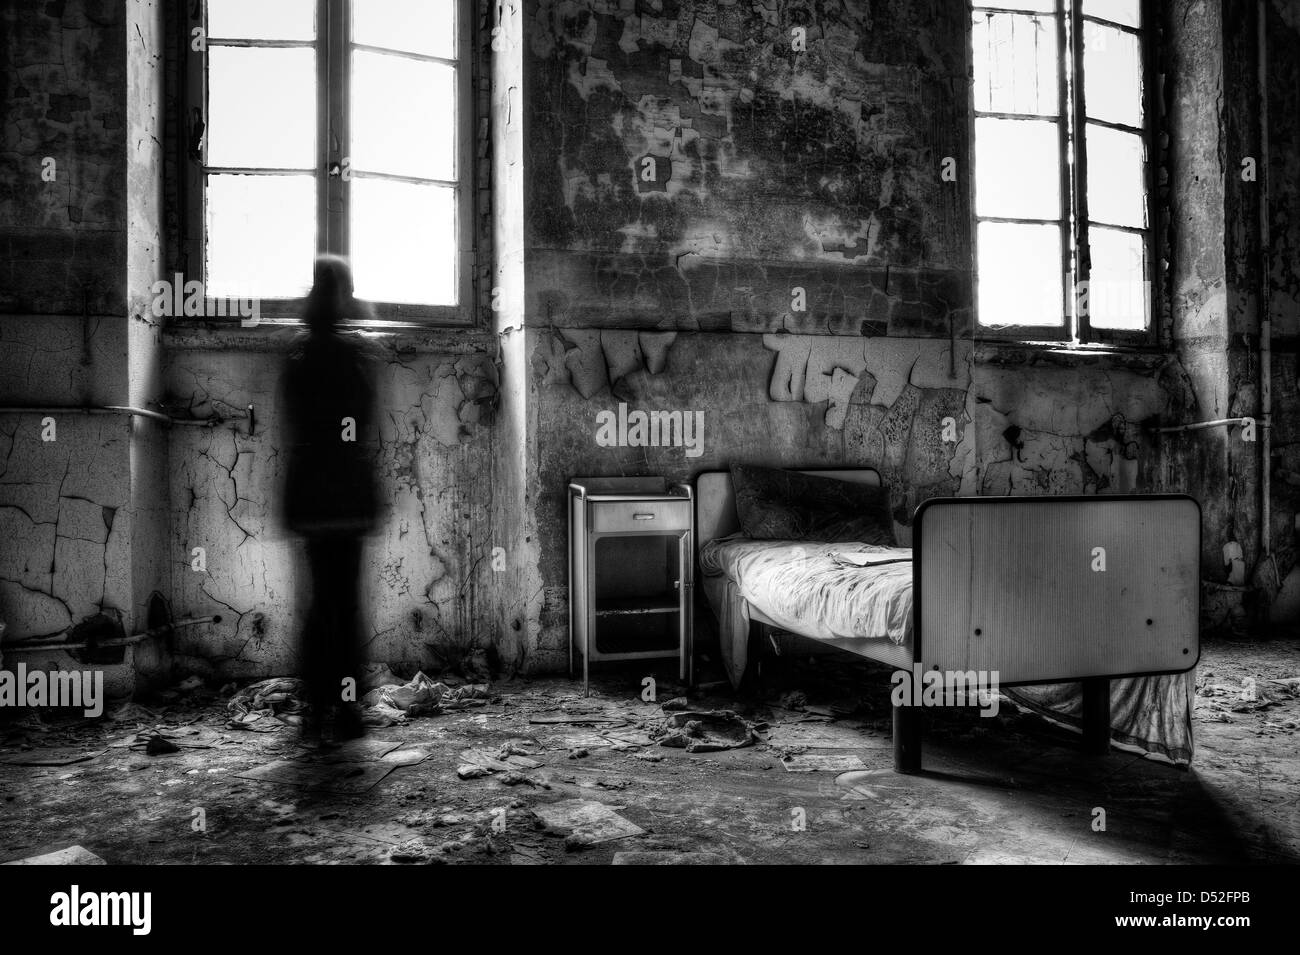 Abandoned Psychiatric Hospital Room